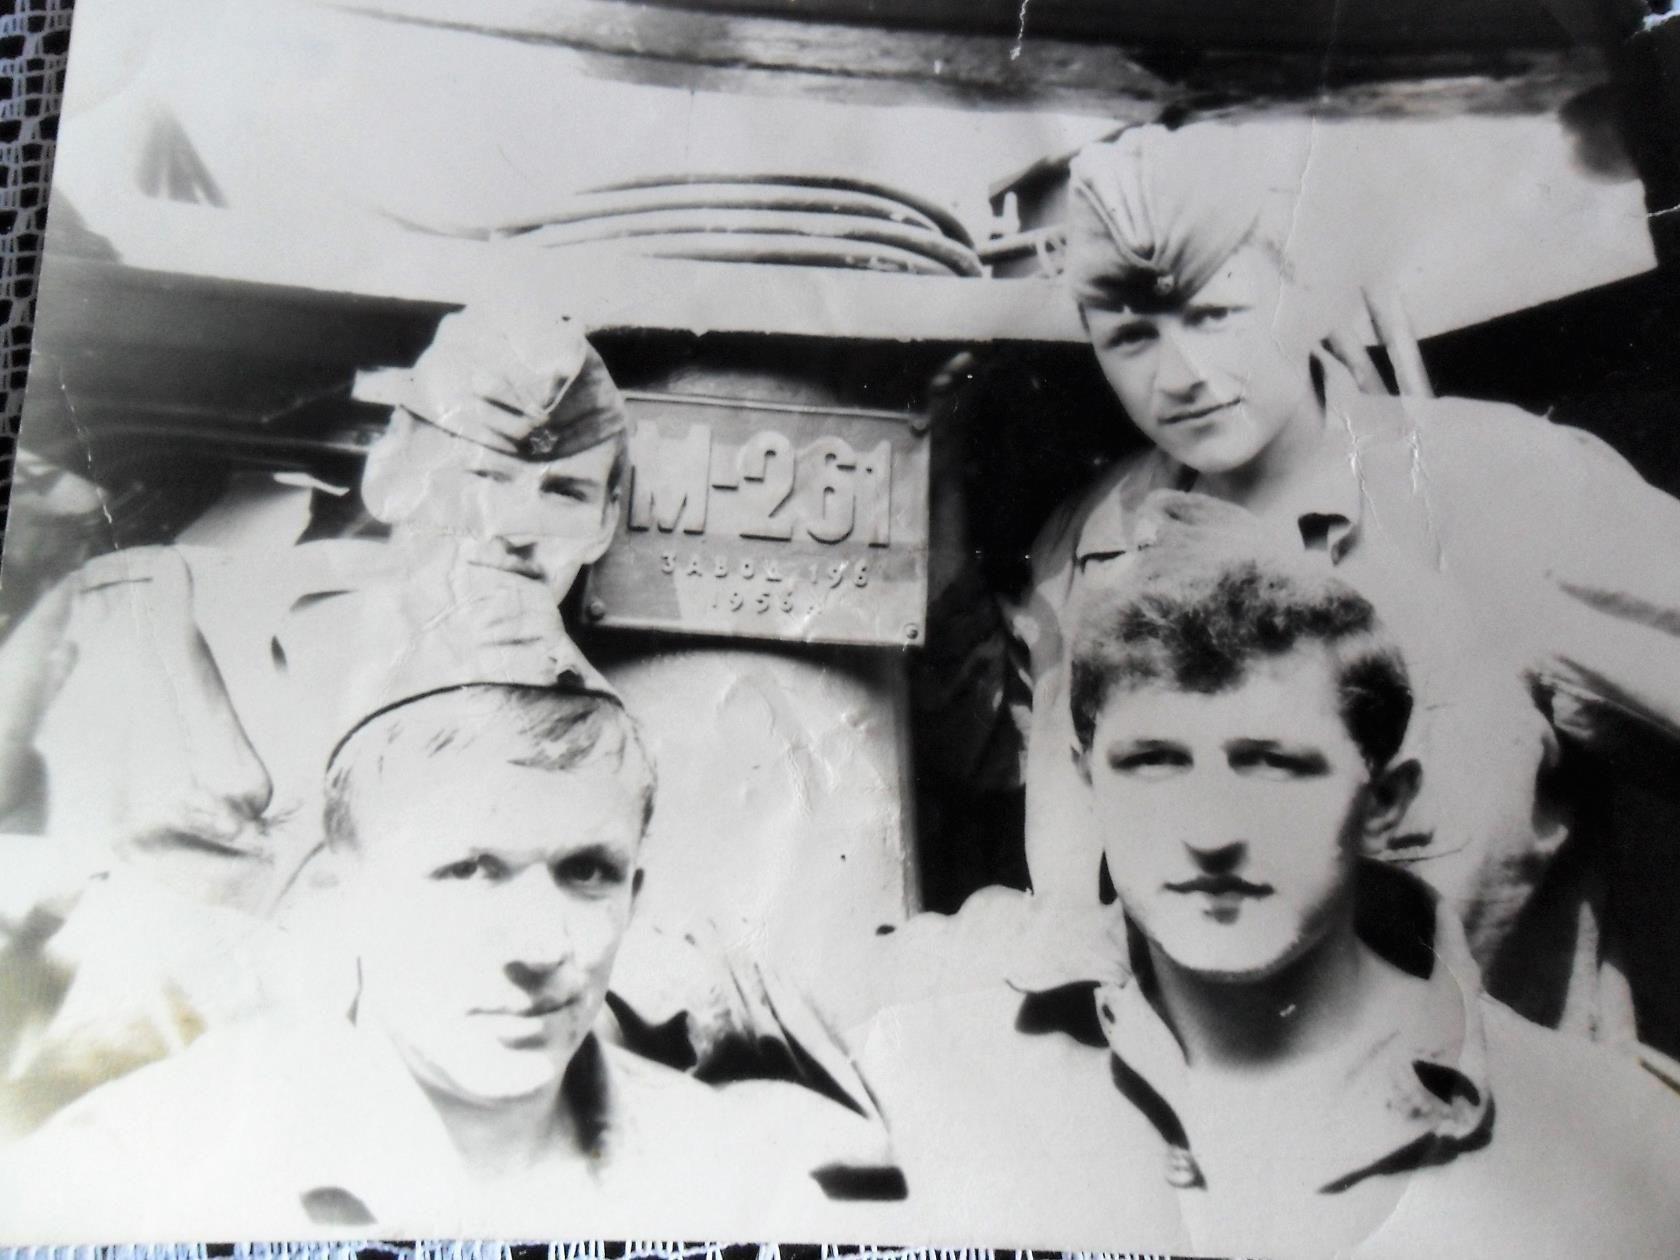 Экипаж ПЛ М-261 ©Фото из личного архива Михаила Васильченко